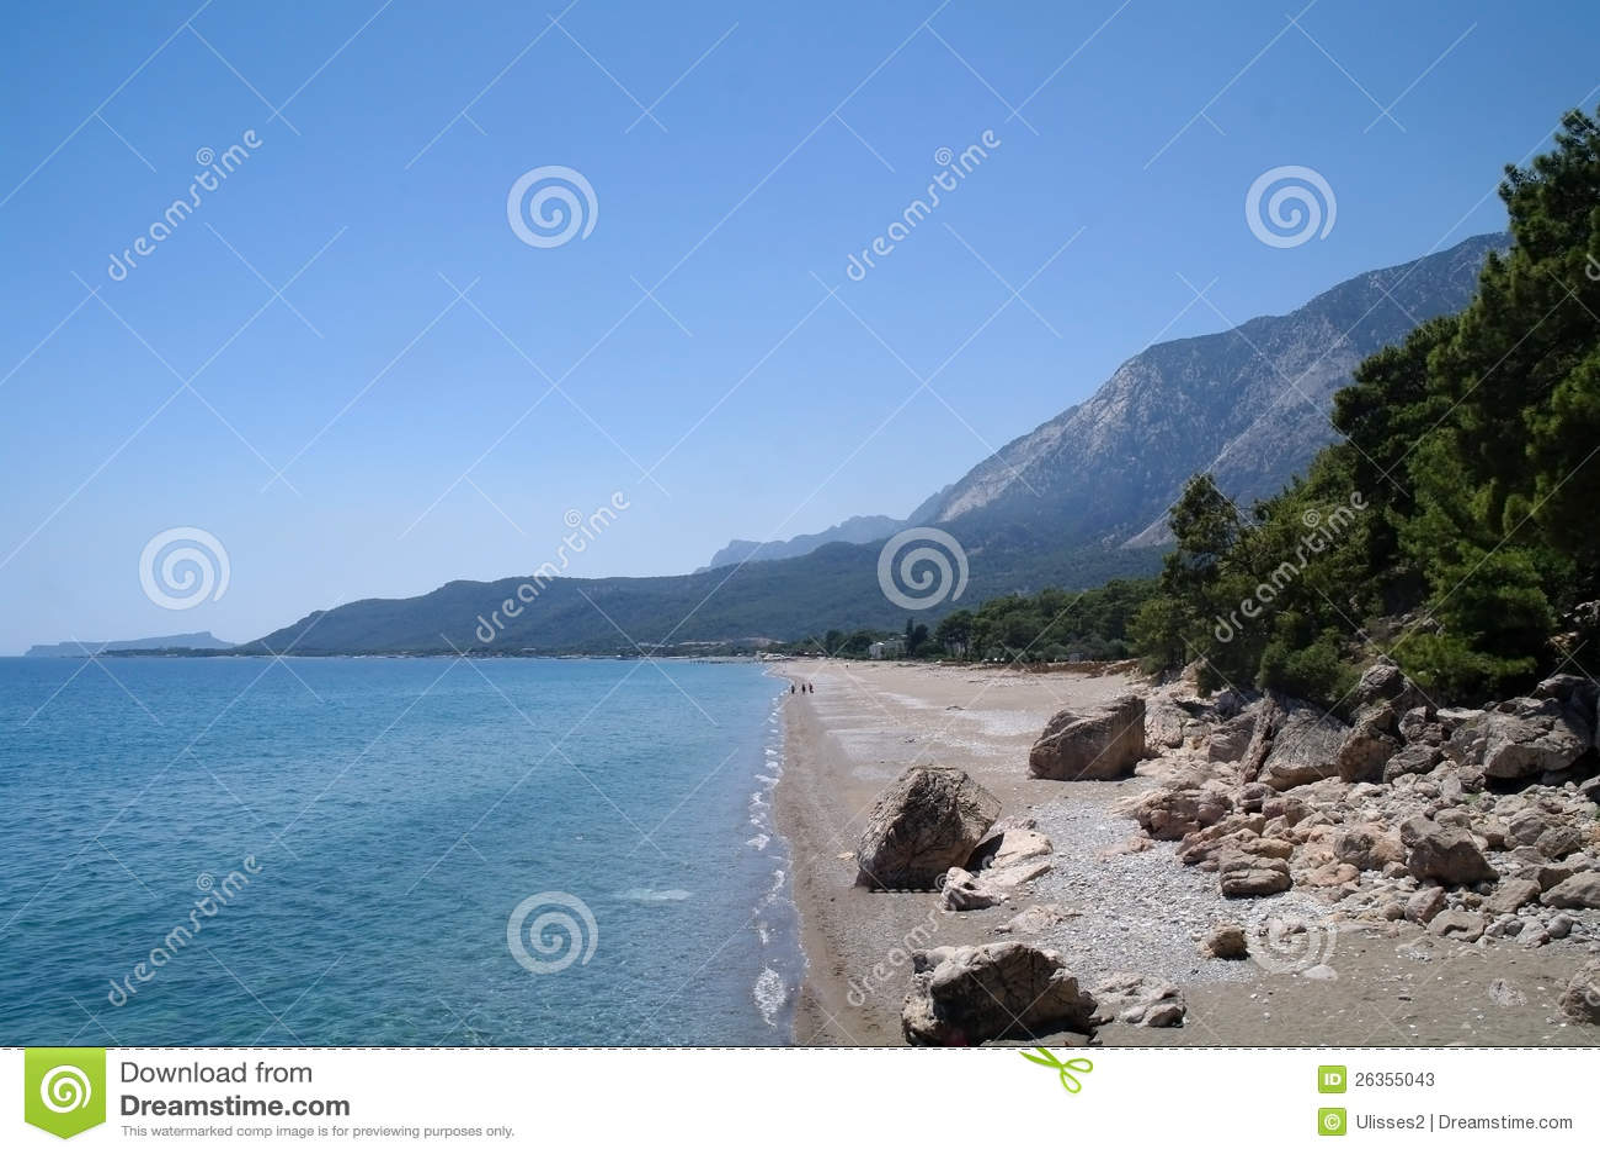 Schöner Meerblick des Mittelmeerwassers